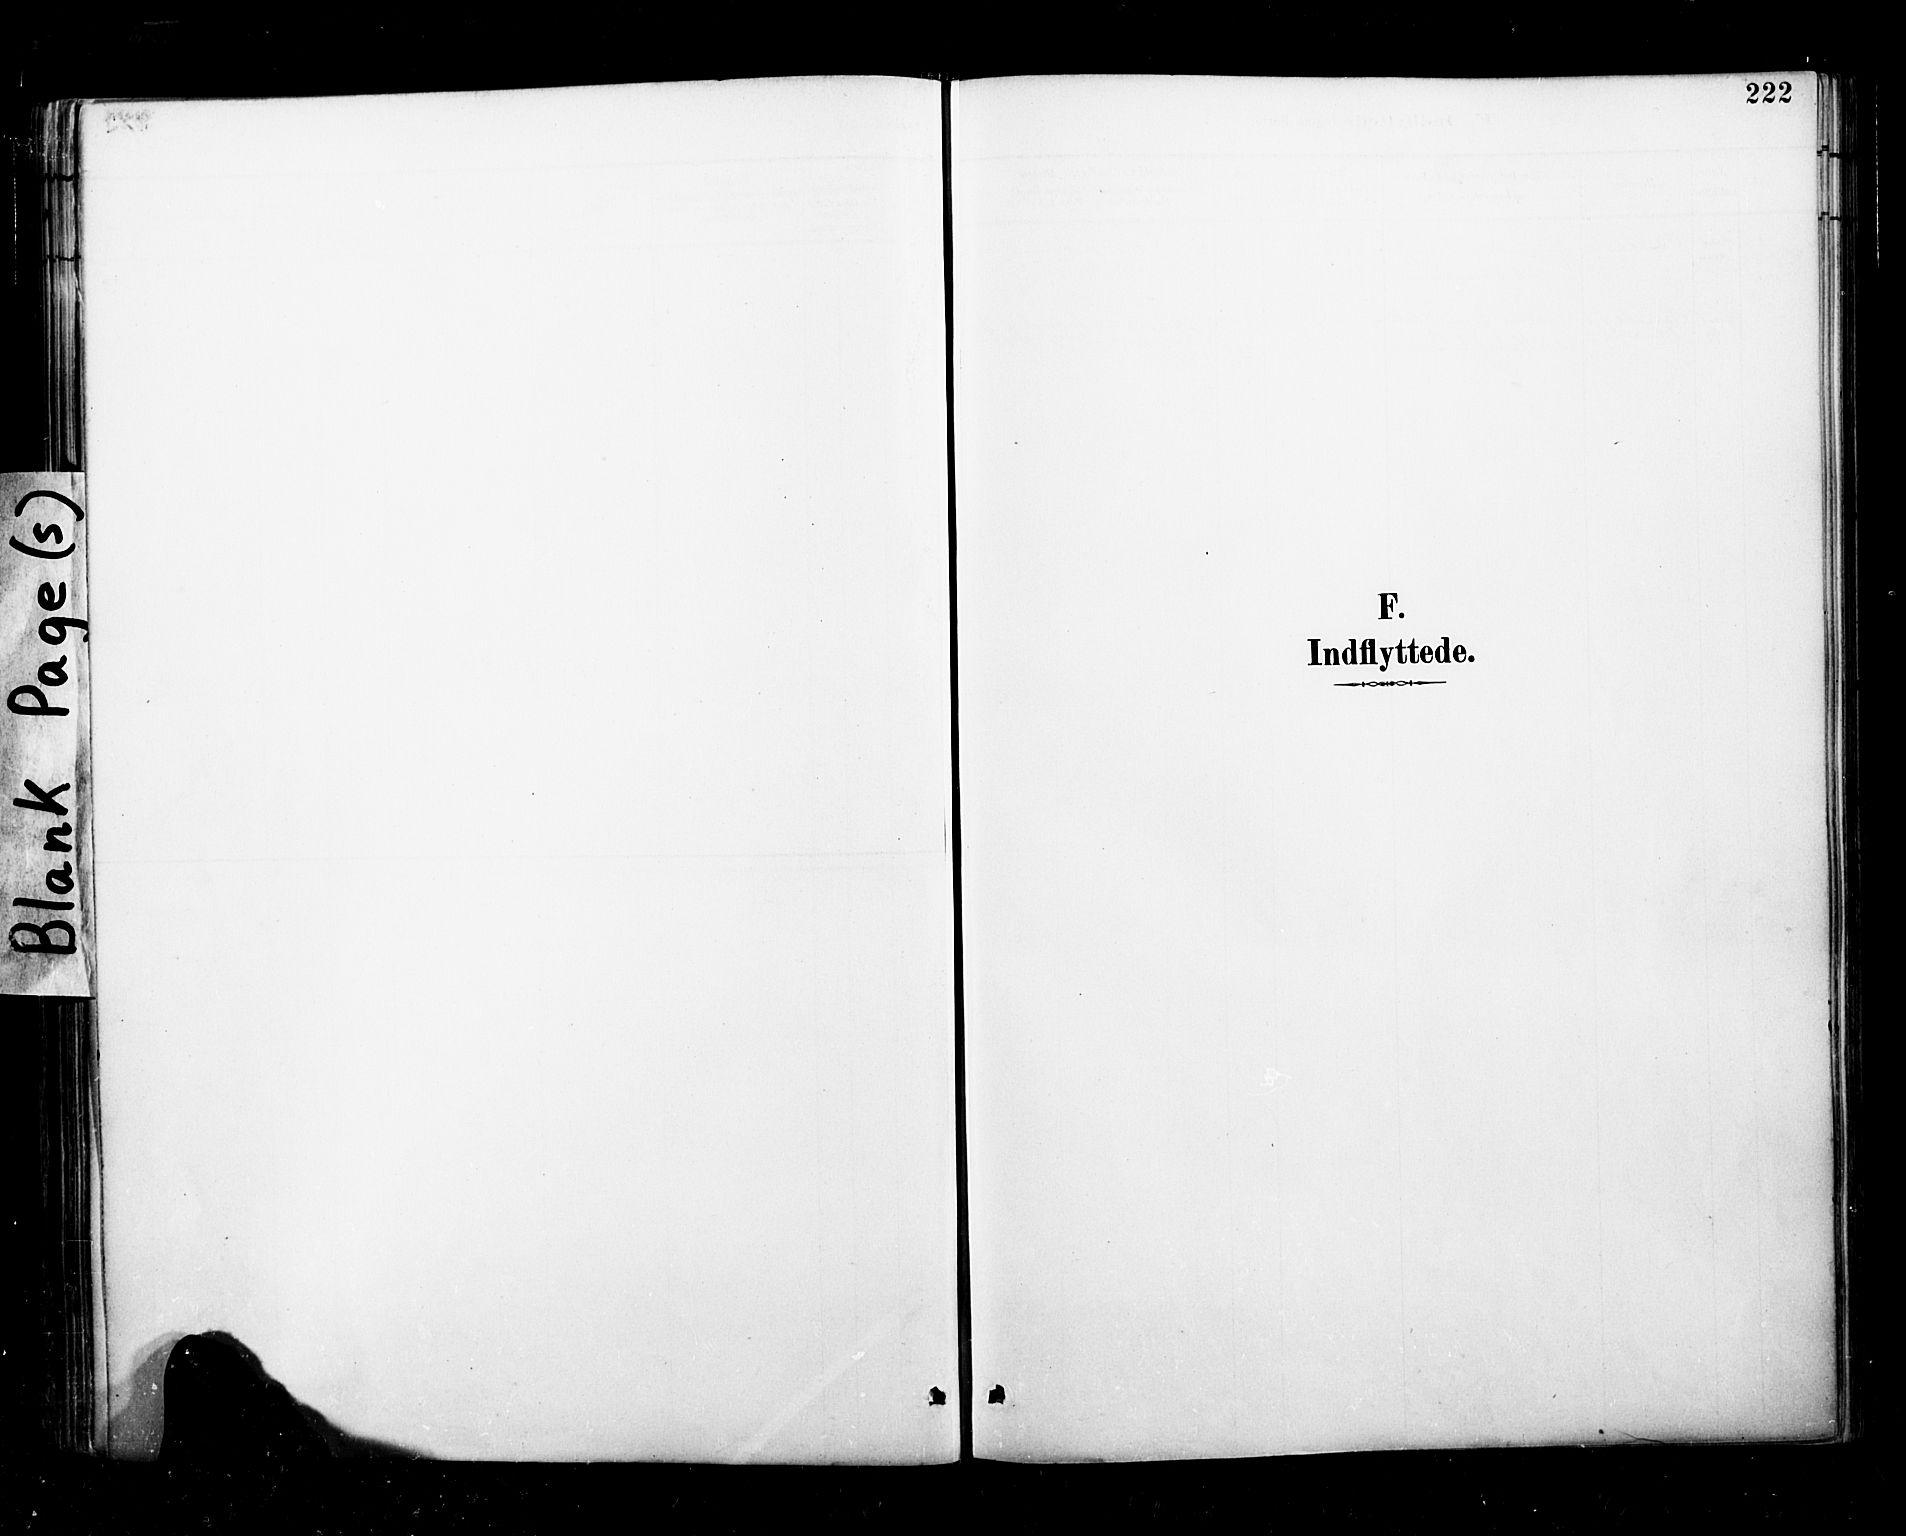 SAT, Ministerialprotokoller, klokkerbøker og fødselsregistre - Nordland, 827/L0401: Ministerialbok nr. 827A13, 1887-1905, s. 222